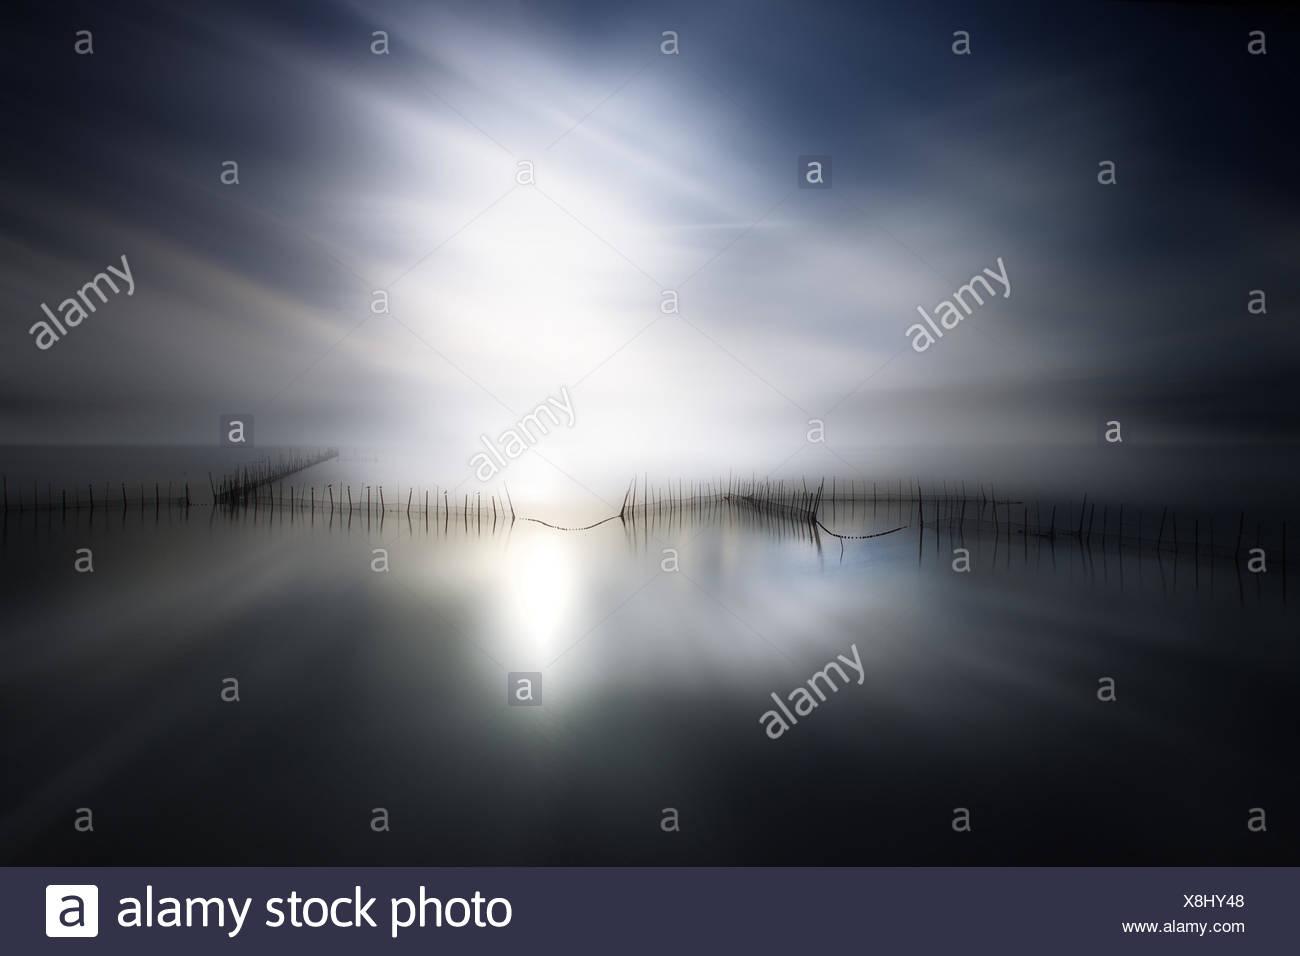 Sunlight over lake - Stock Image